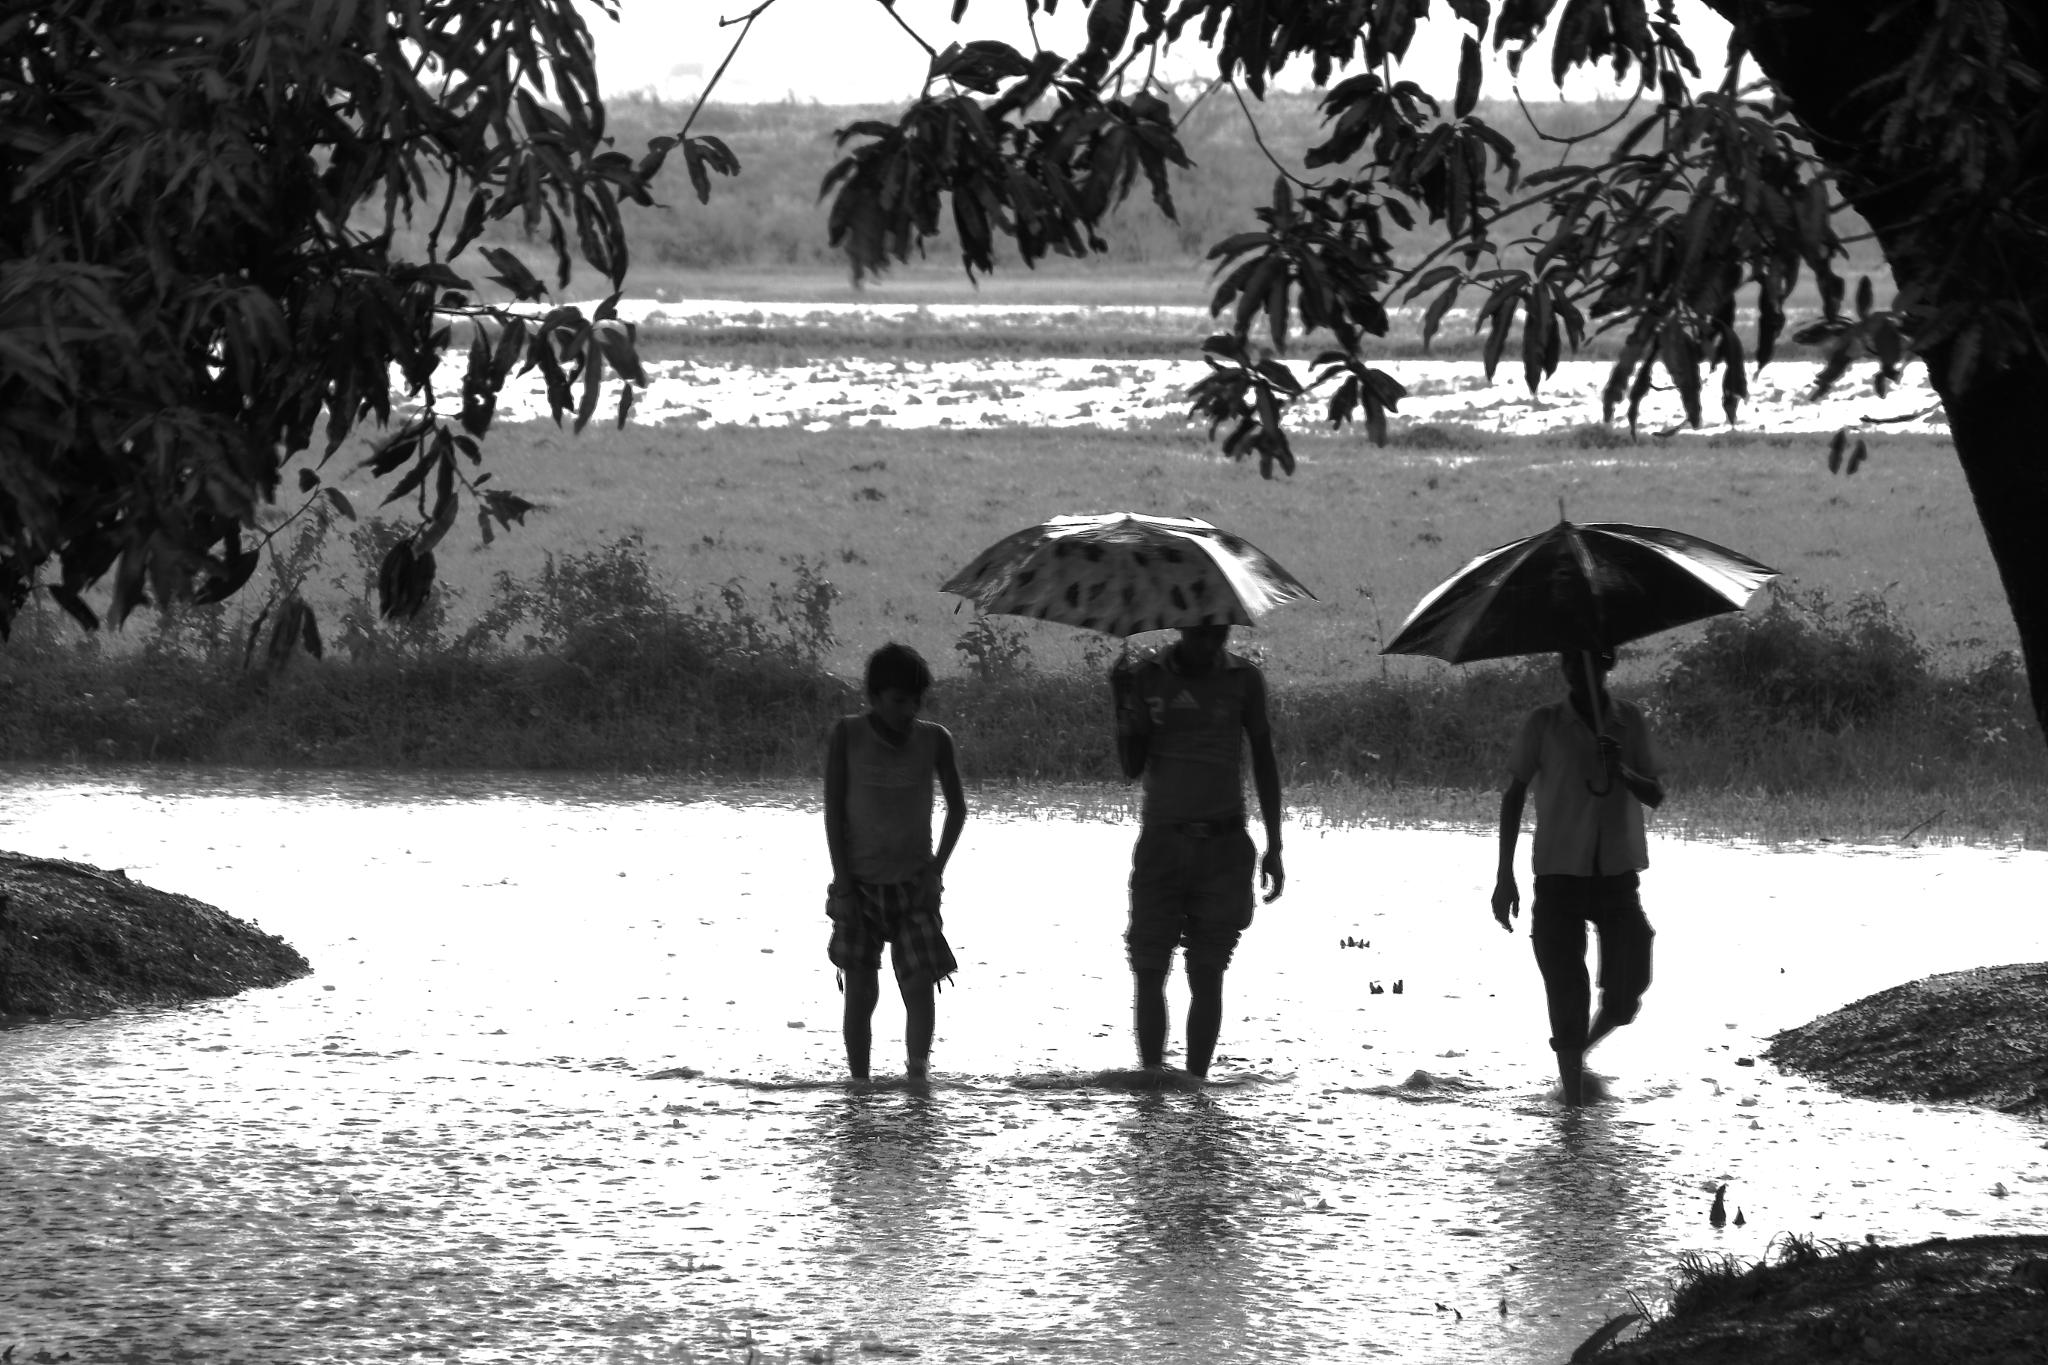 MONSOON by Jayant Mathur